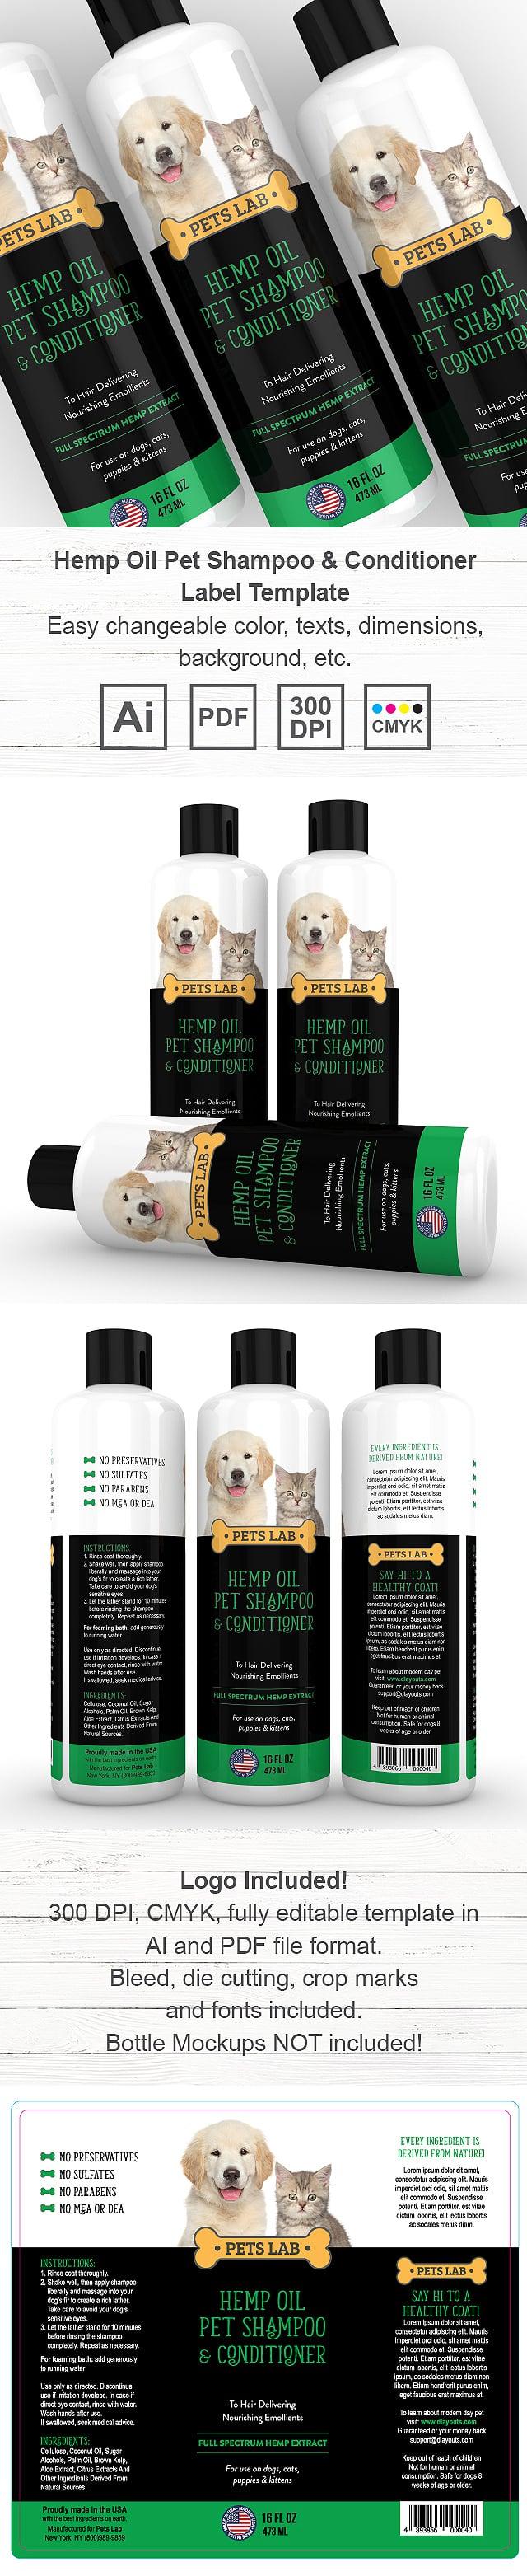 Hemp Oil Pet Shampoo & Conditioner Label Template